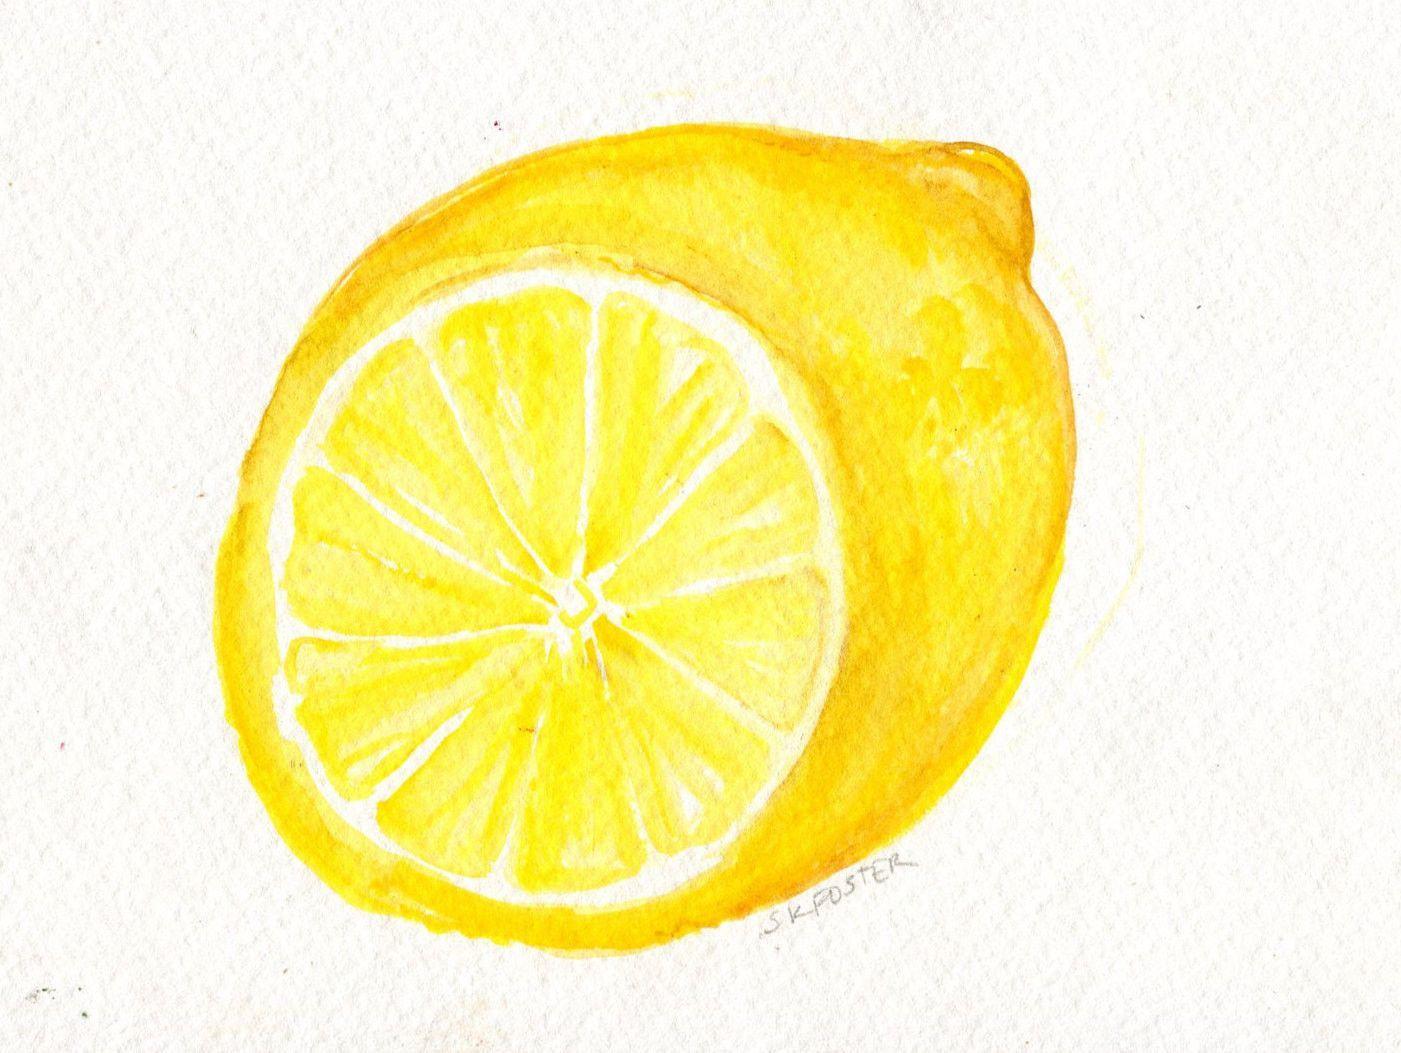 Lemon watercolor painting lemon painting artwork original lemon wall art lemon illustration 5 x 7 lemon kitchen decor modern minimalist